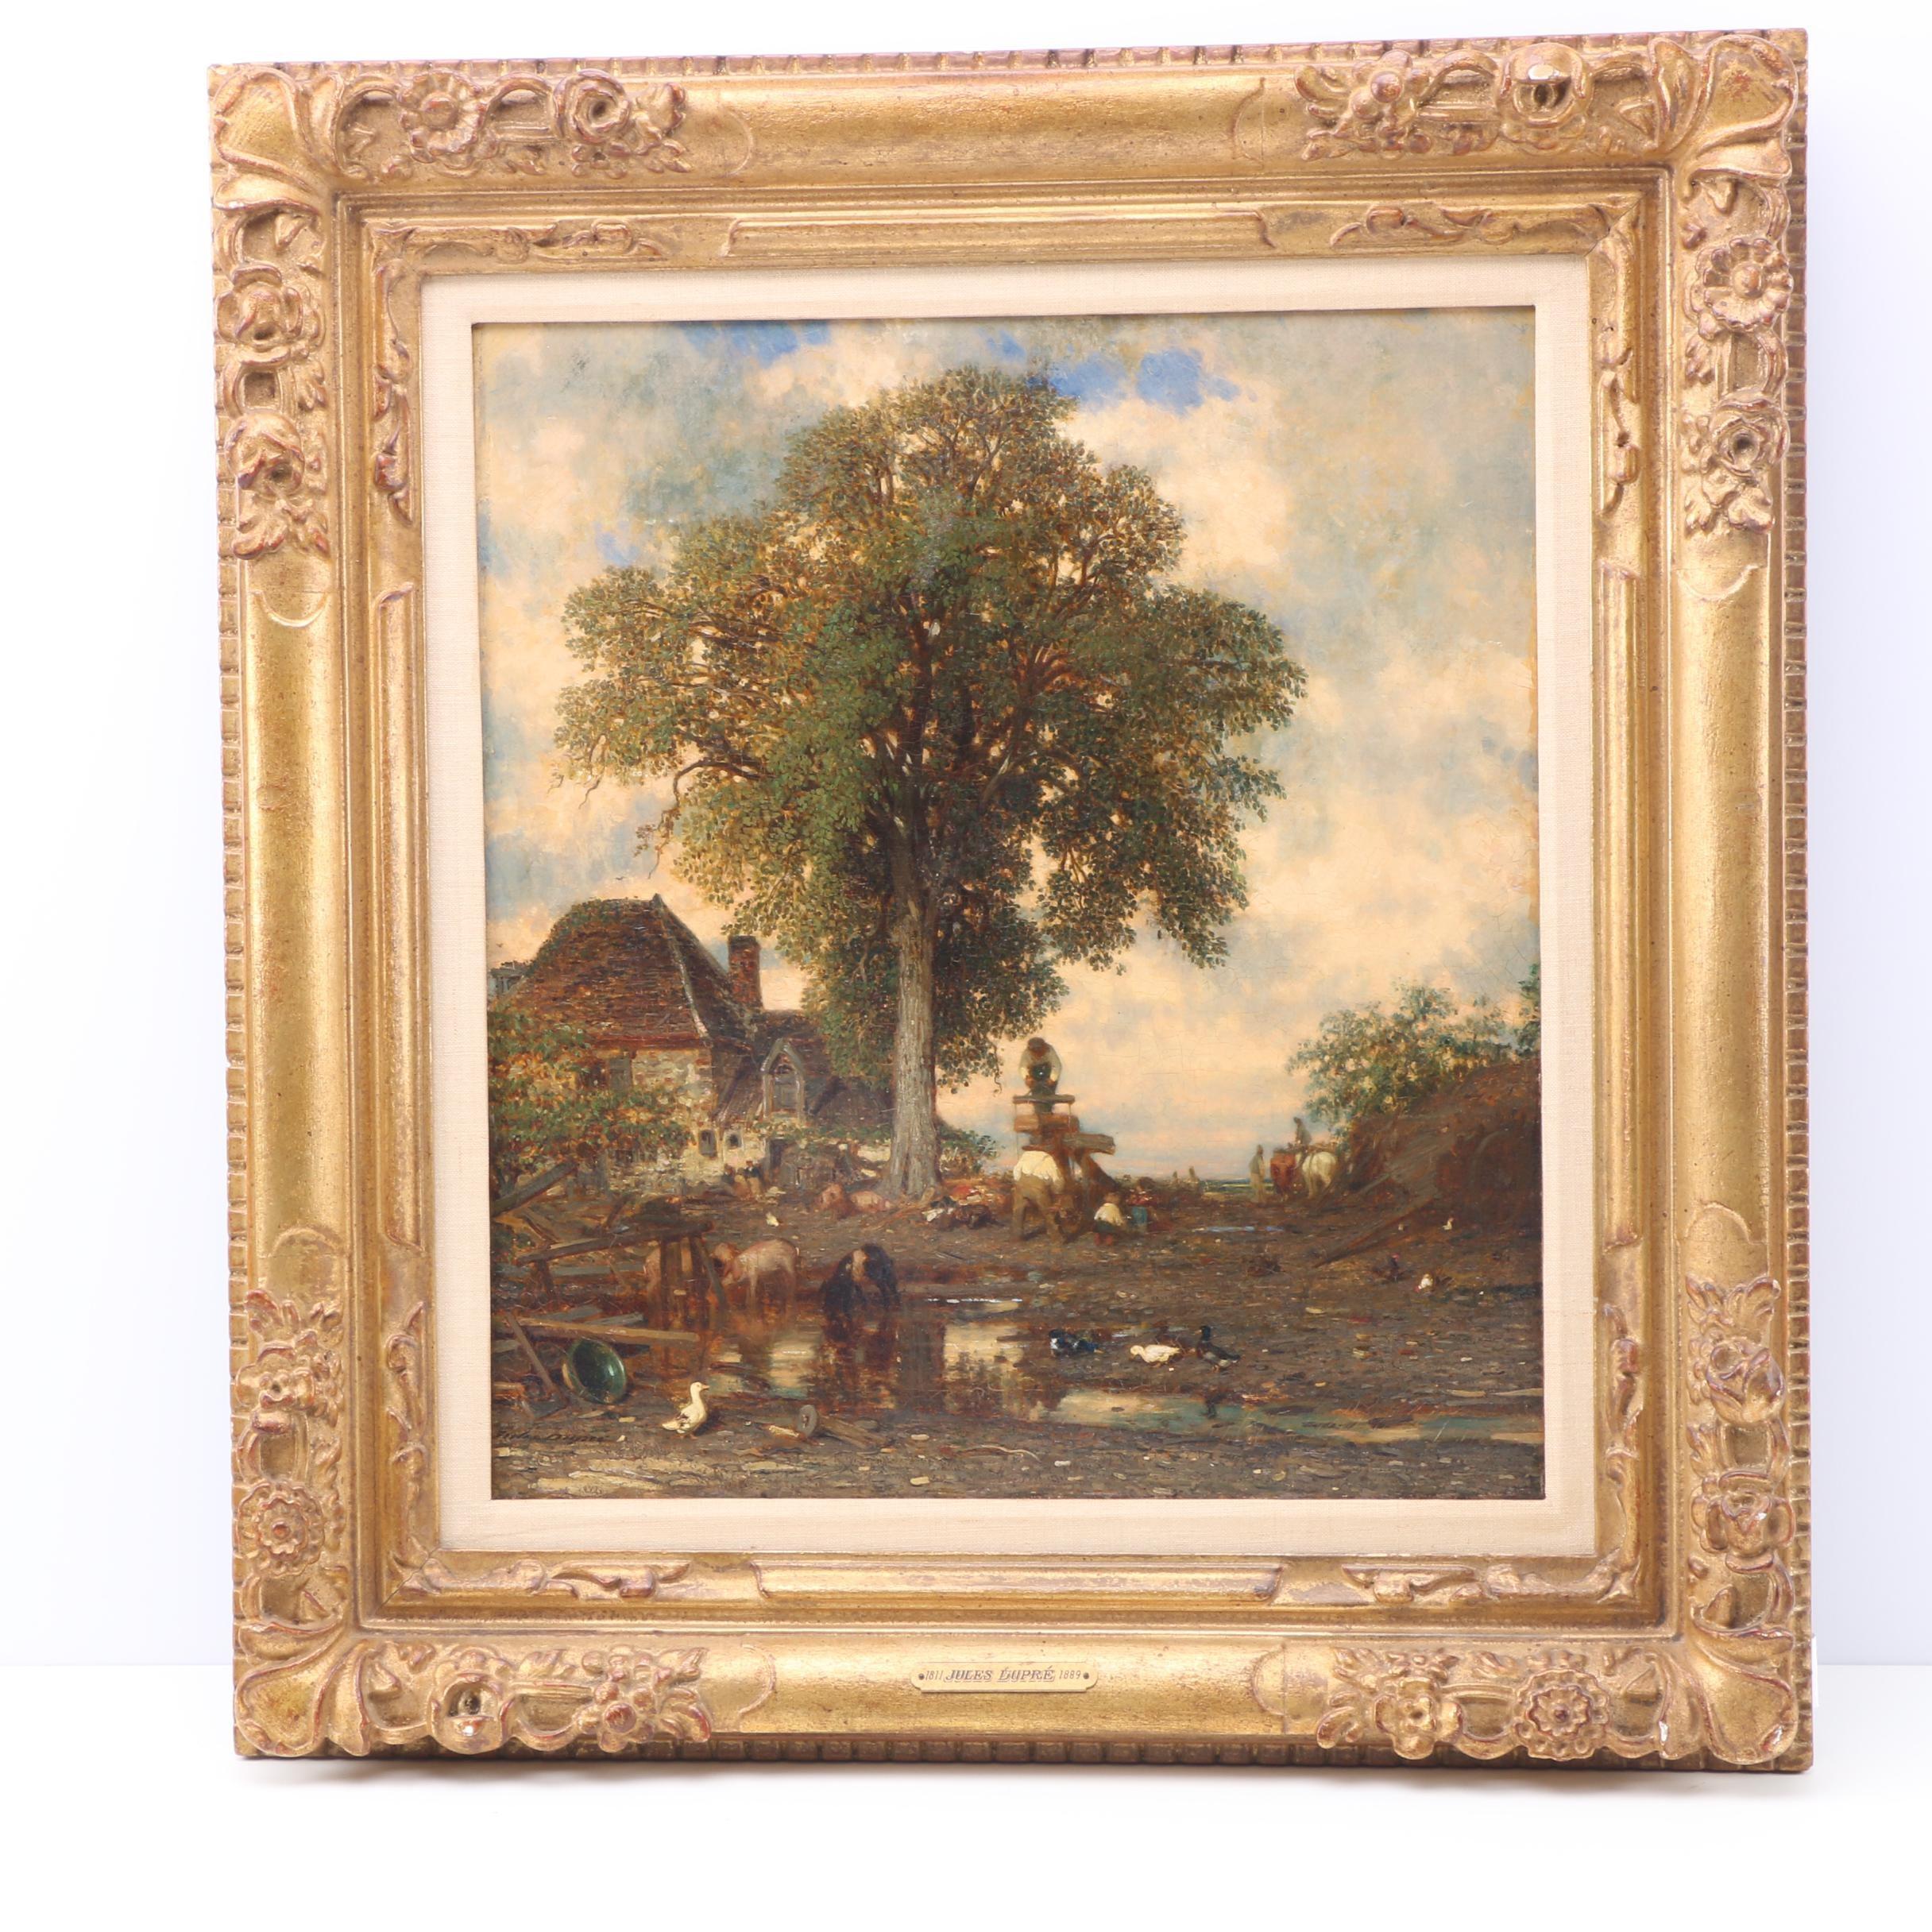 "Jules Dupré Oil Painting on Canvas ""Farmyard"""